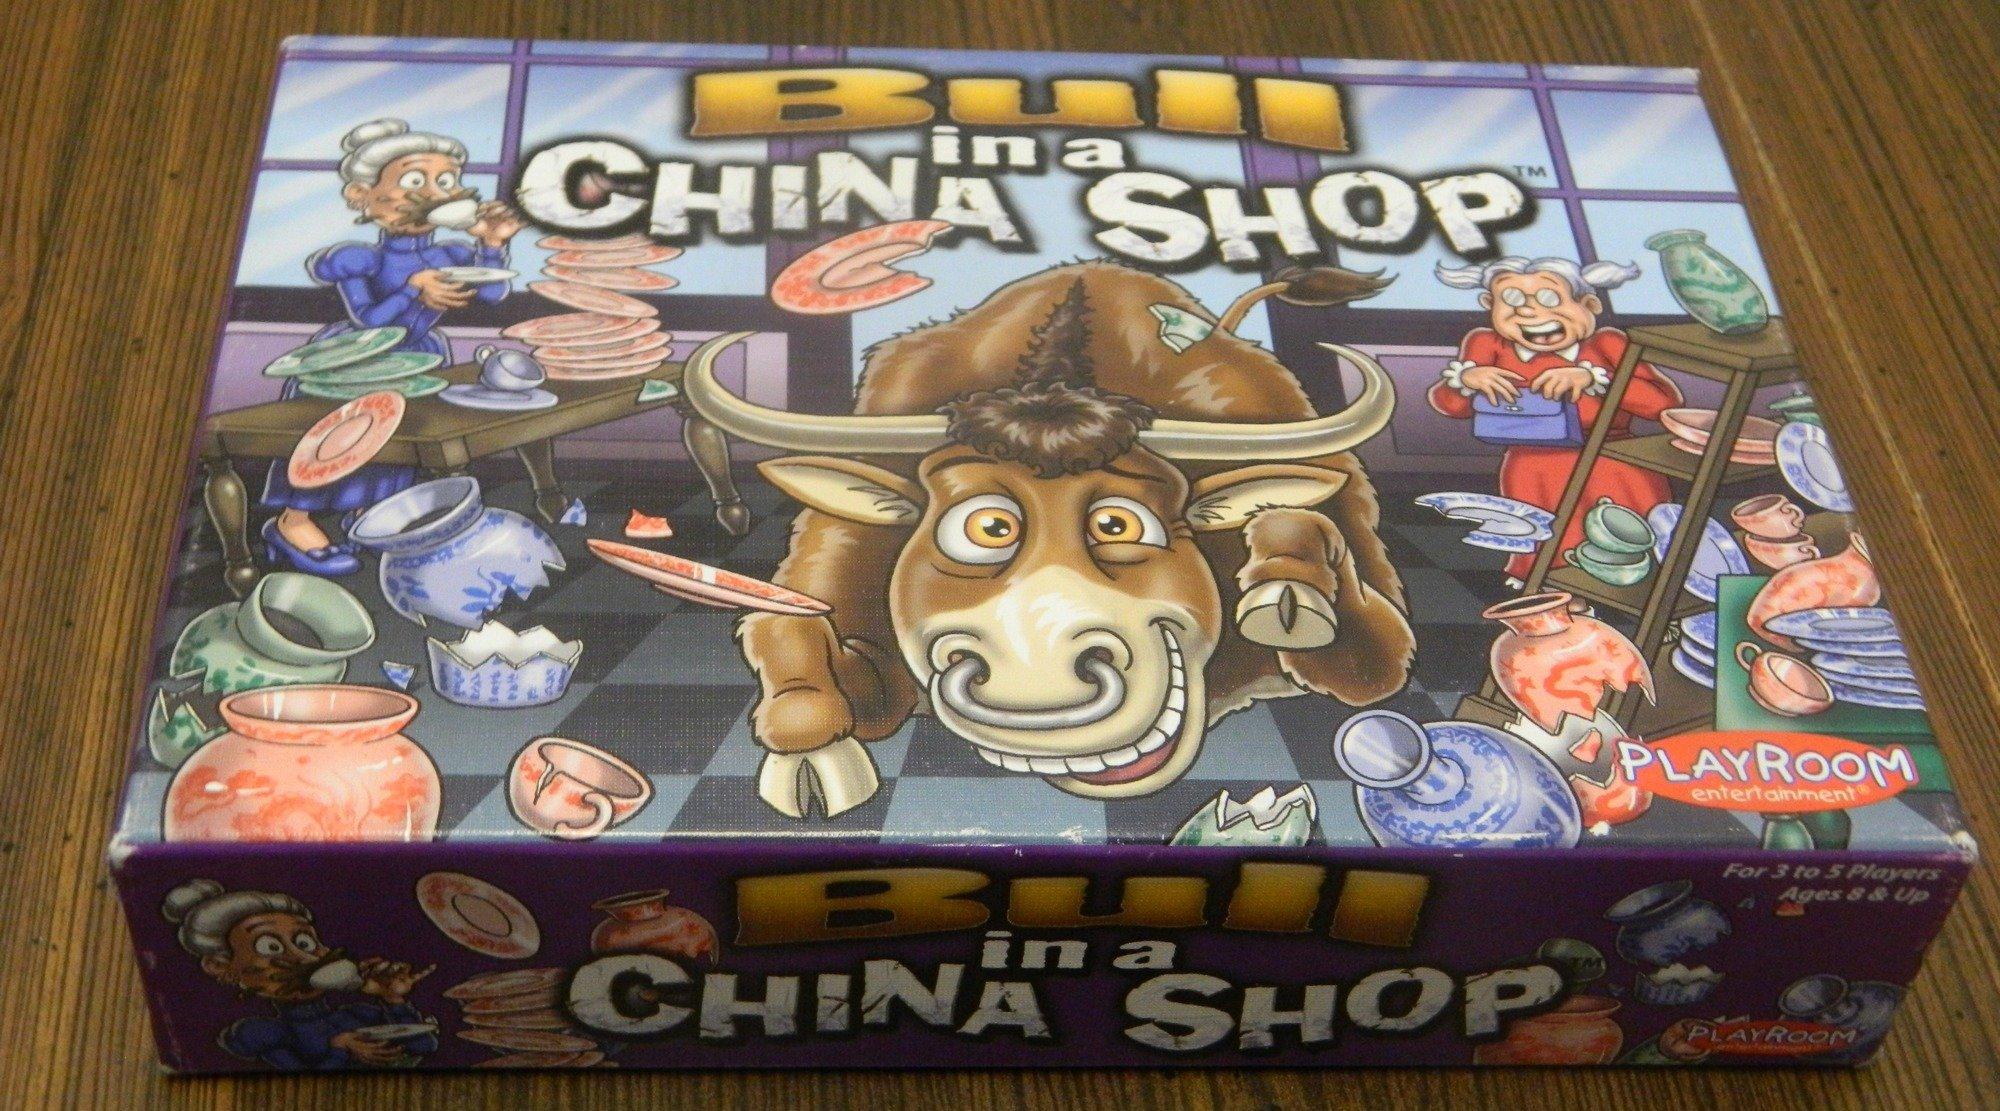 Bull in a China Shop Box